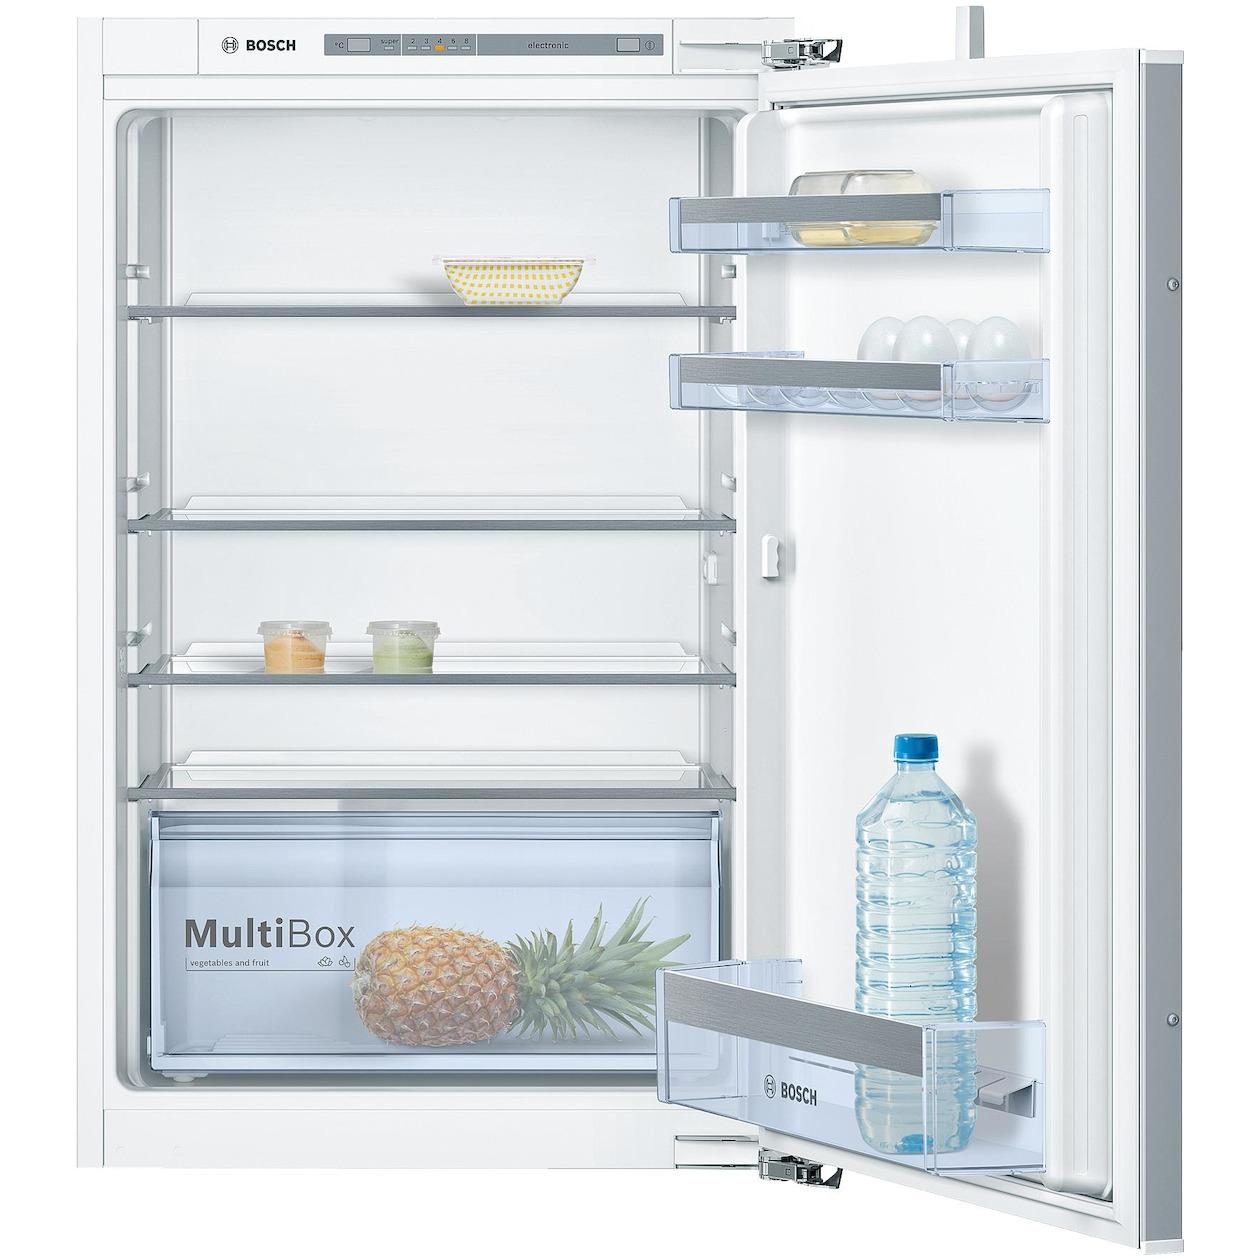 Bosch inbouw koelkast KIR21VF30